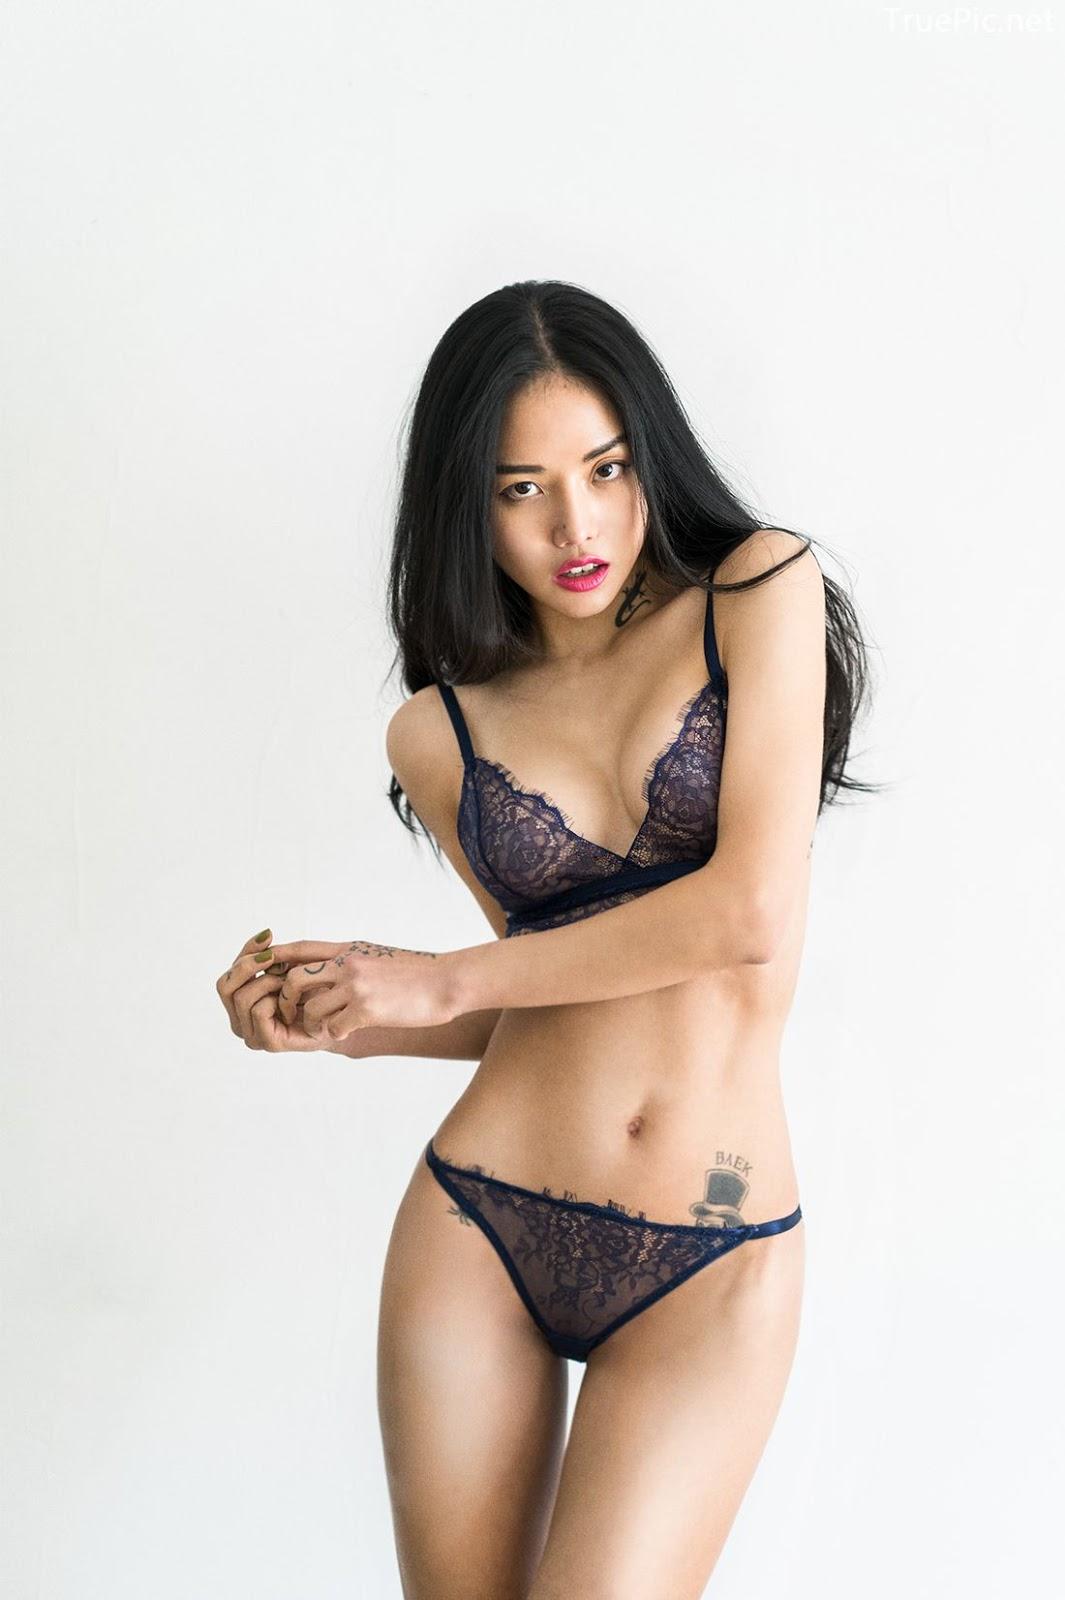 Korean Fashion Model - Baek Ye Jin - Sexy Lingerie Collection - TruePic.net - Picture 8